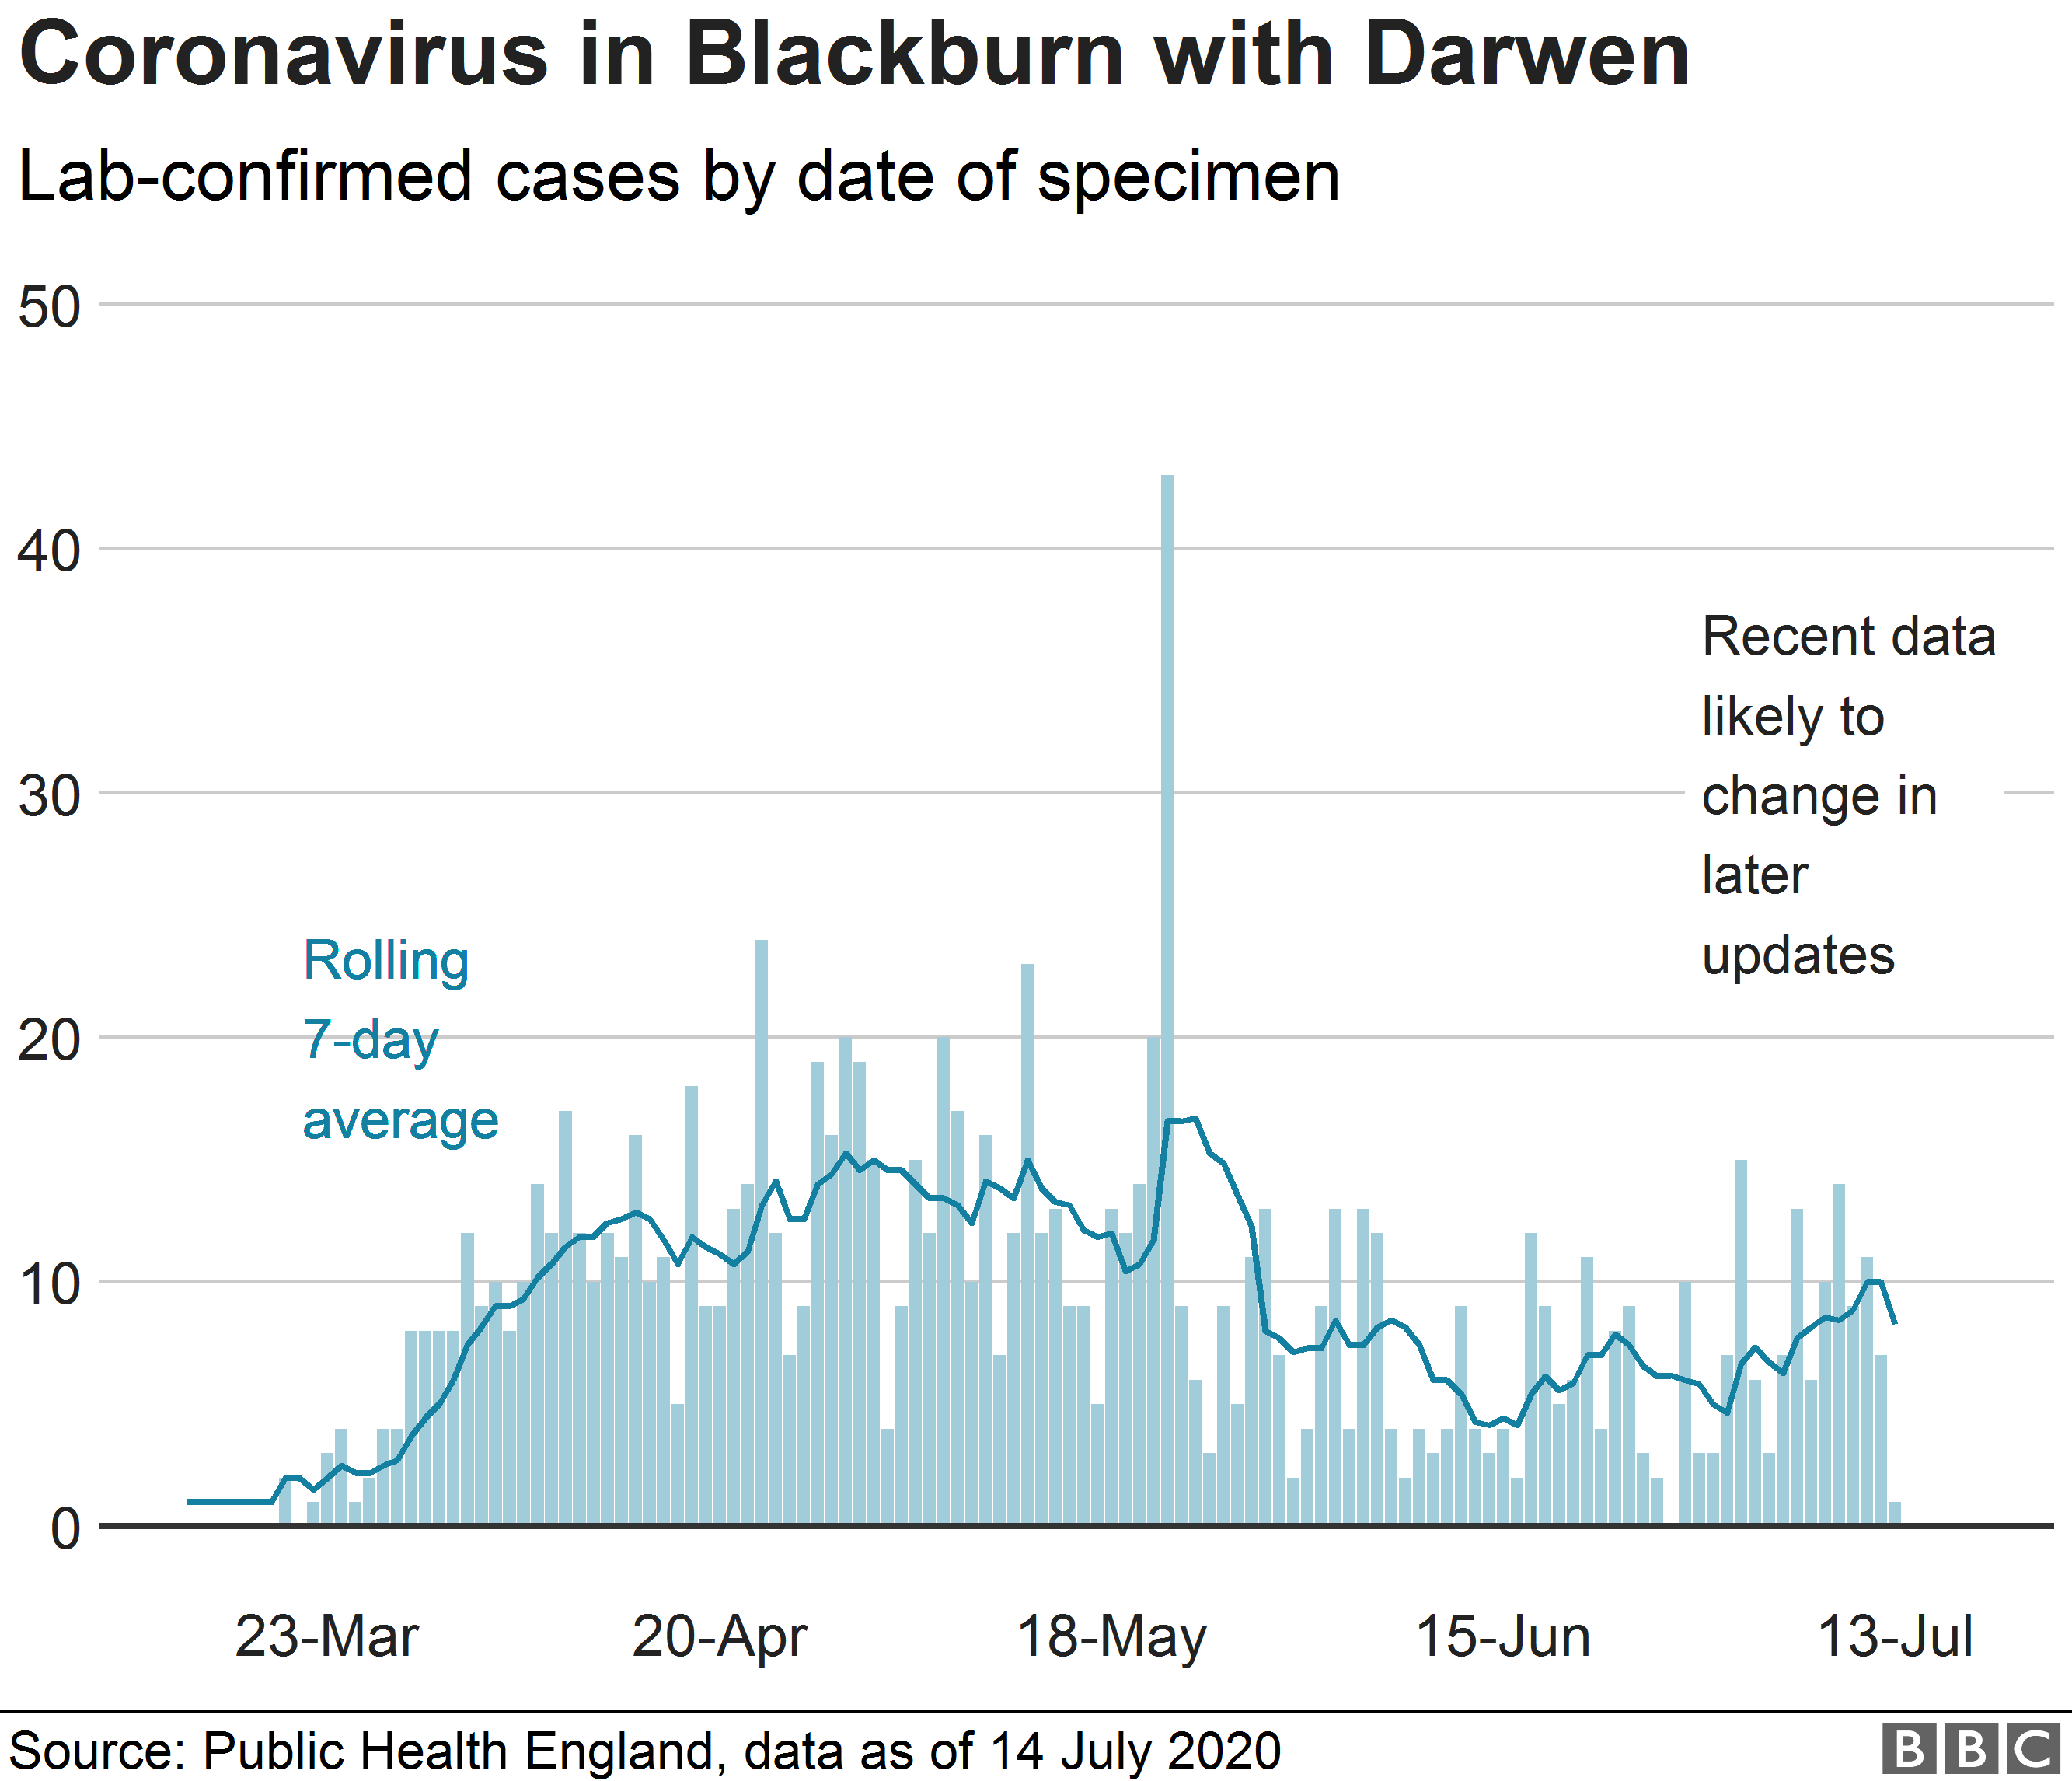 Chart showing confirmed cases of coronavirus in Blackburn with Darwen